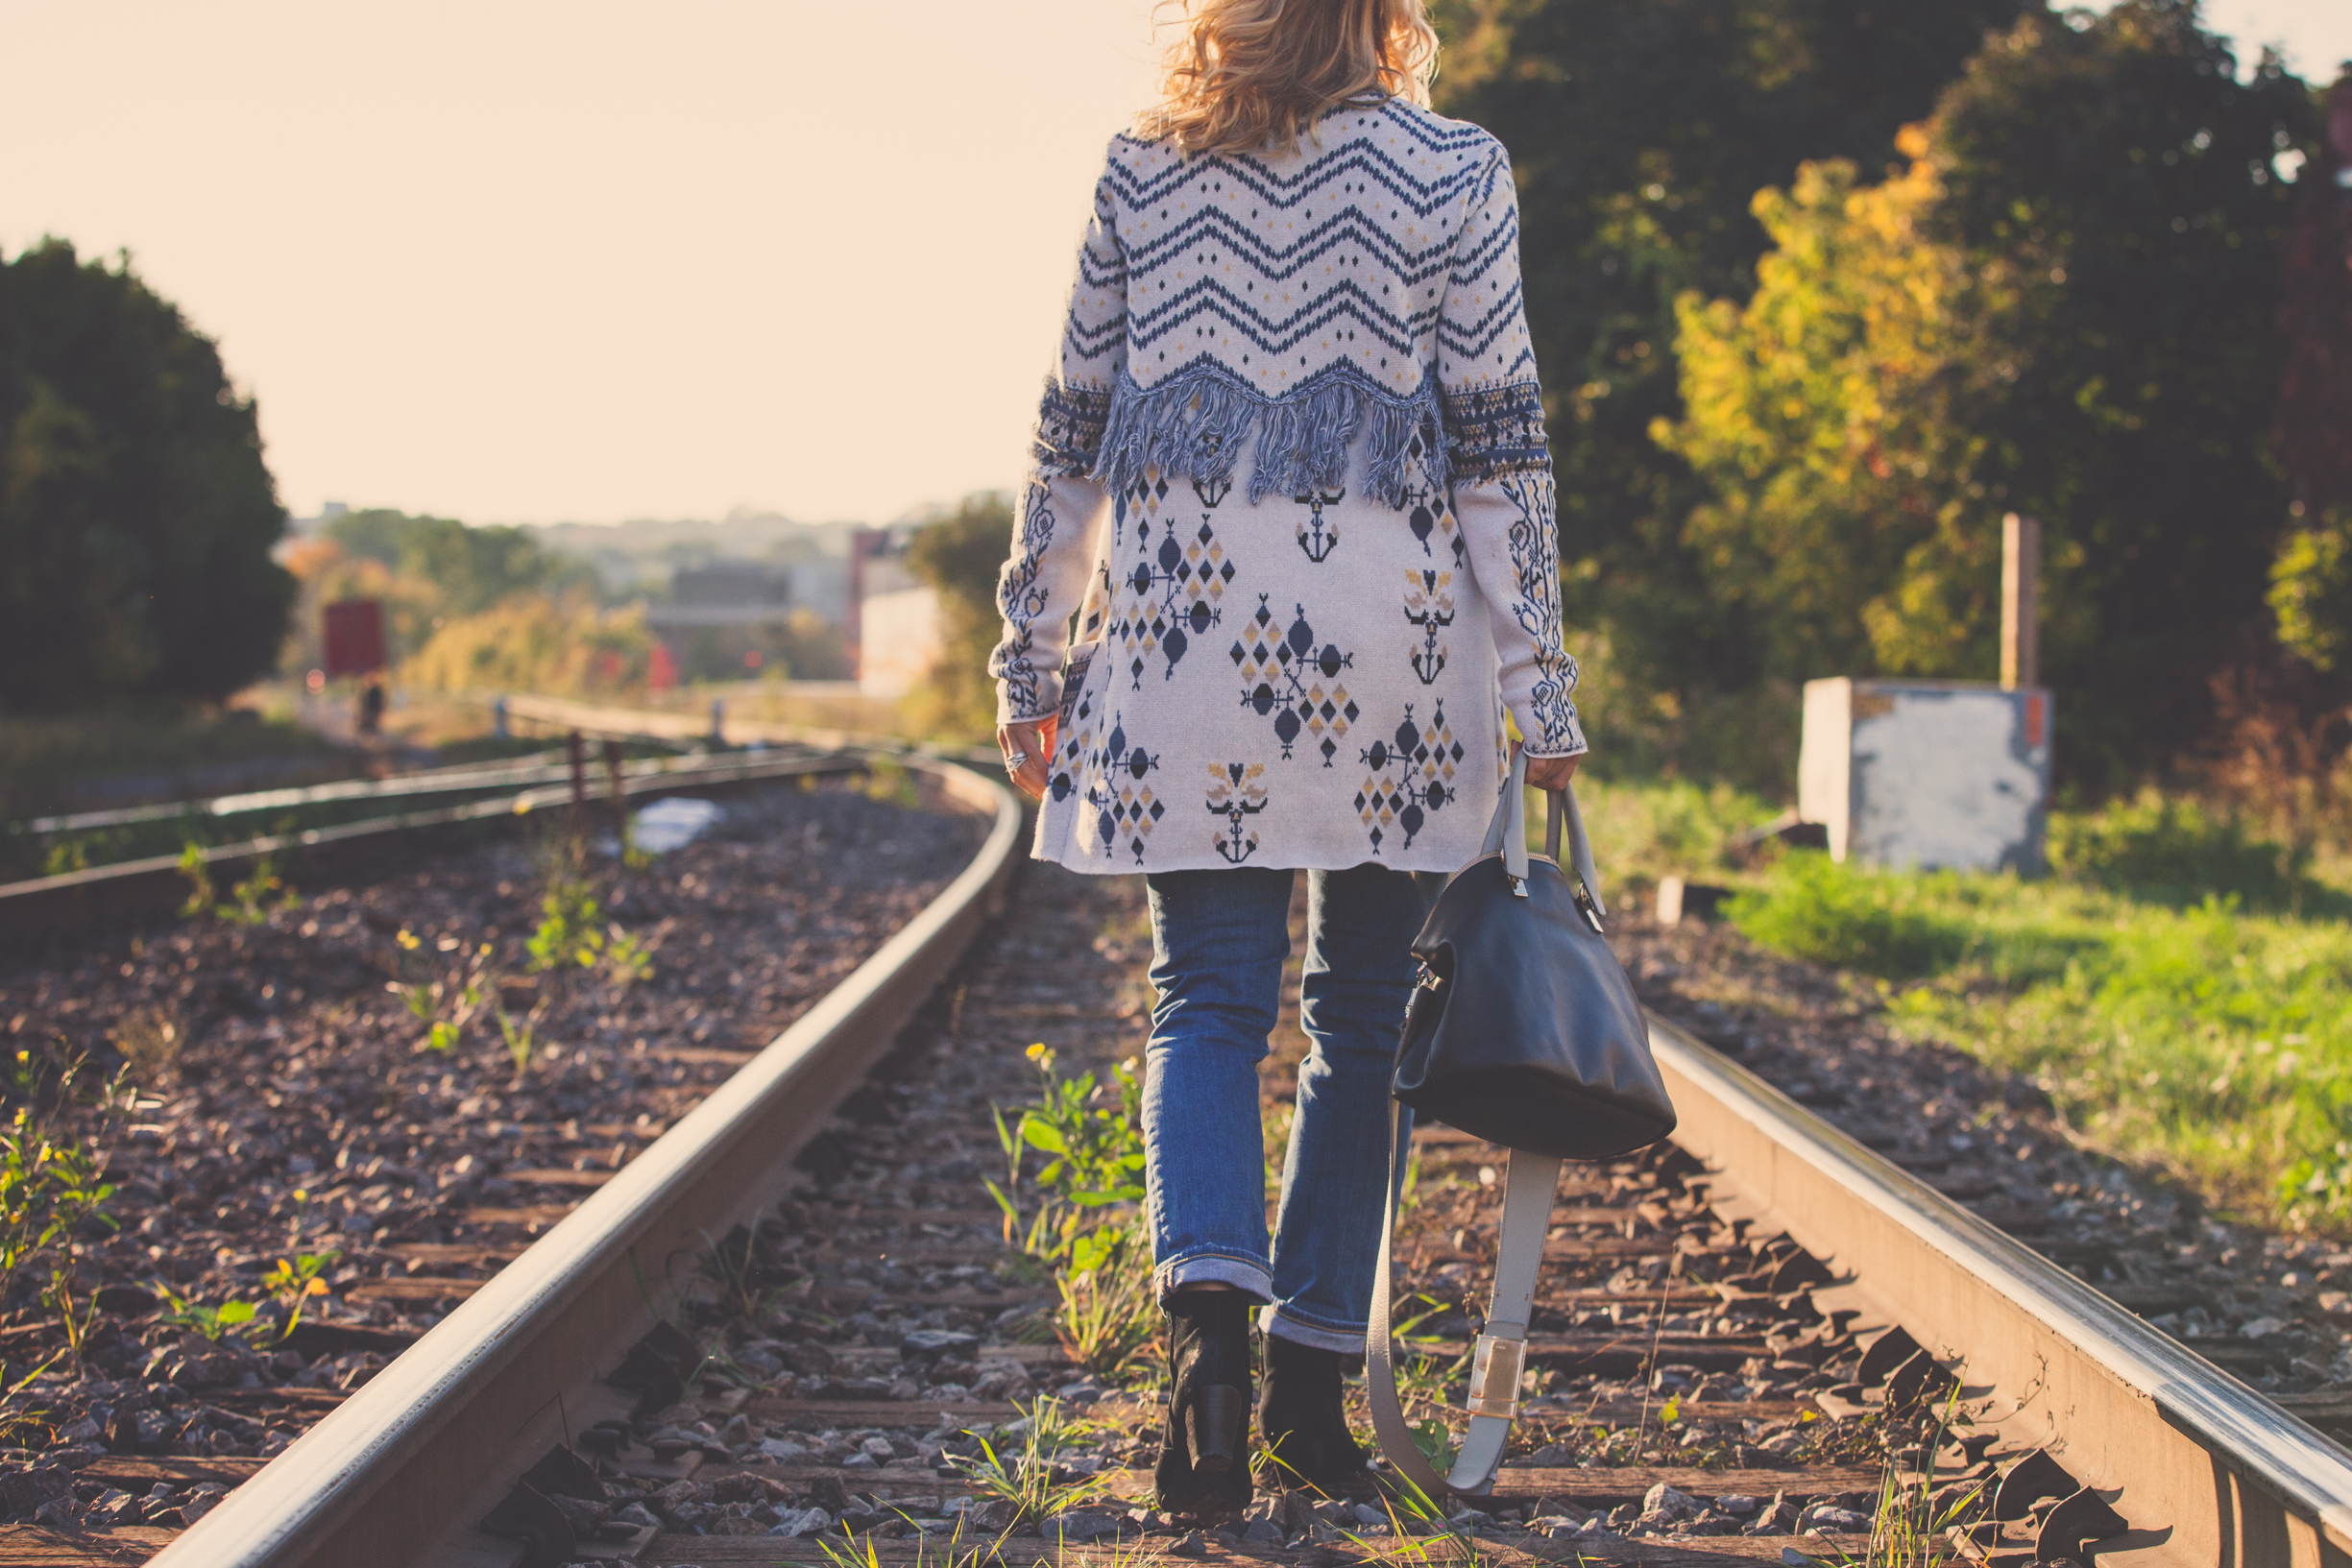 bcbg vest chloé bag mademoiselle jules fashion blog